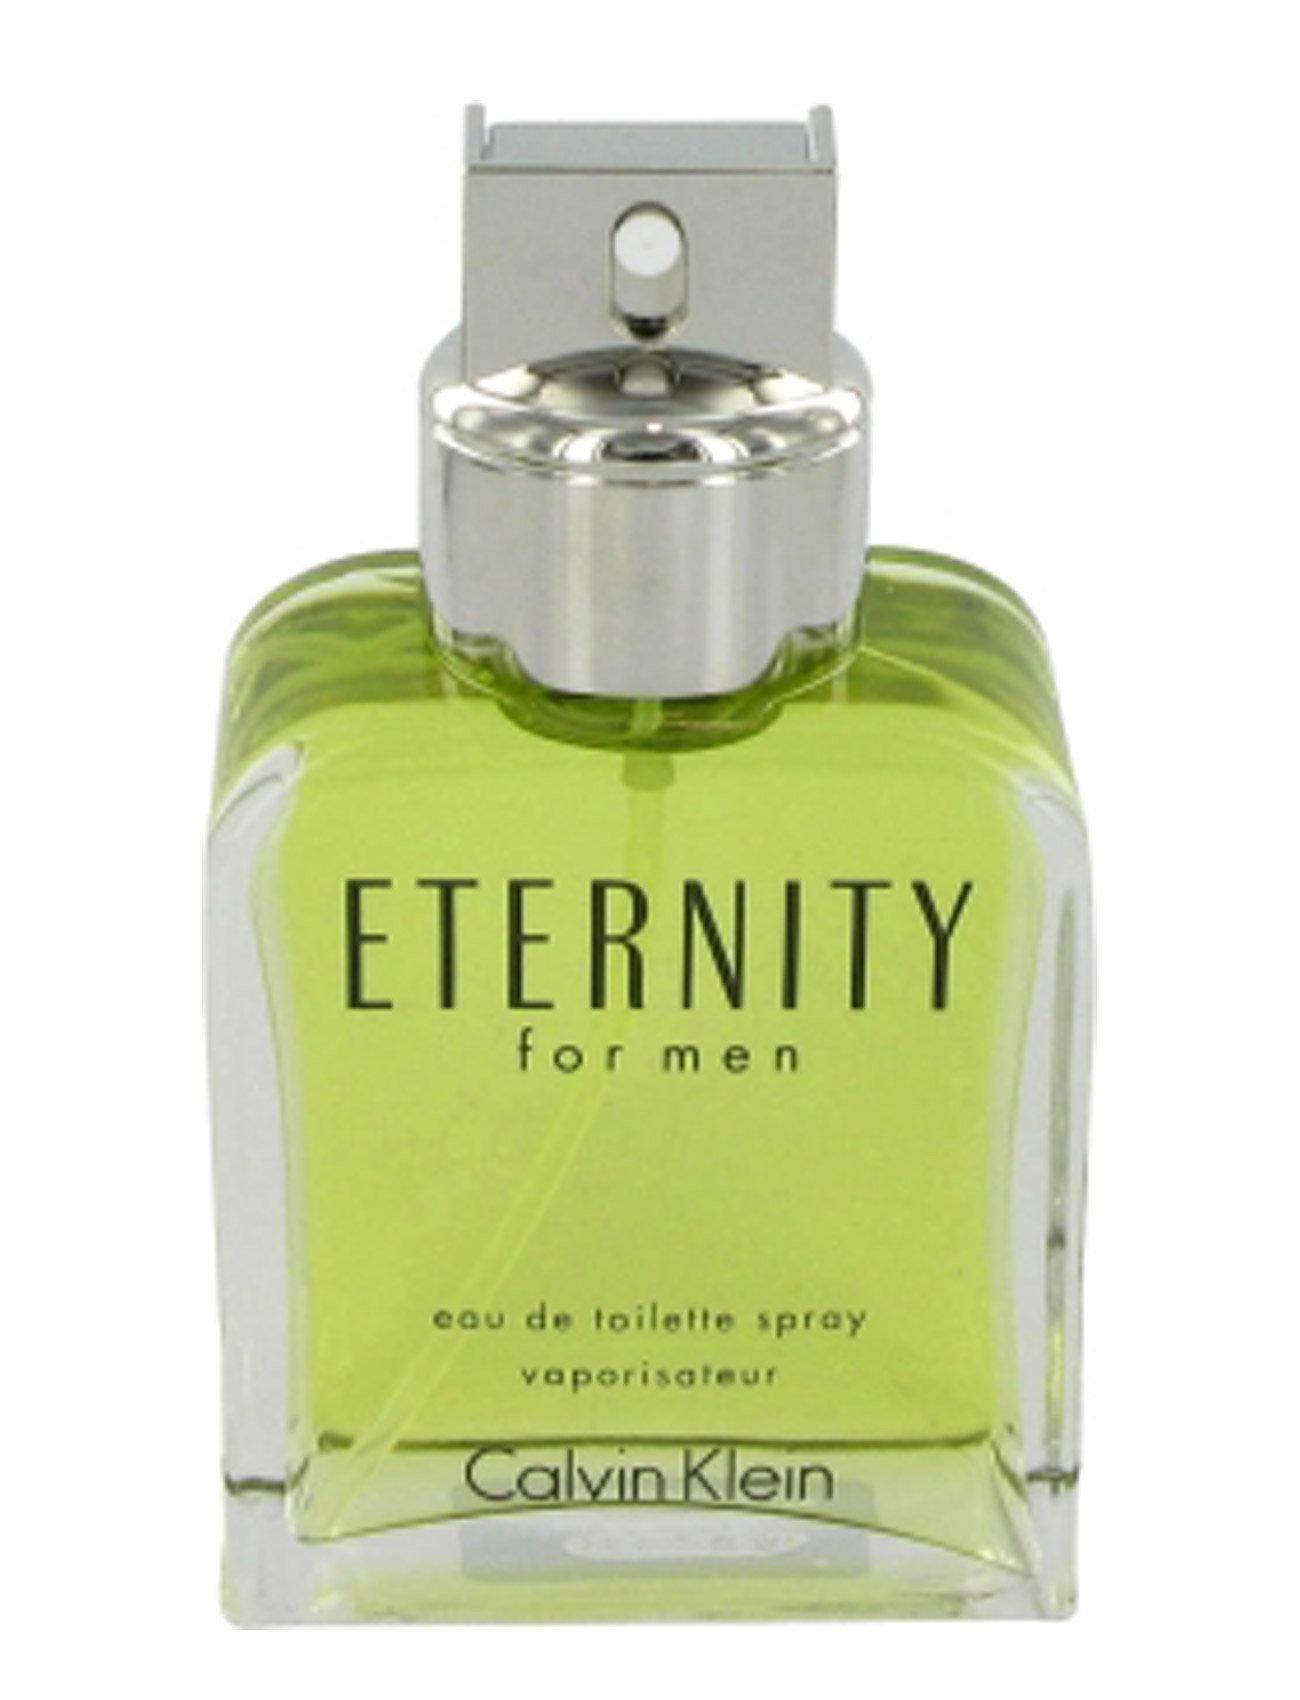 calvin klein fragrance Calvin klein eternity man eau de to fra boozt.com dk